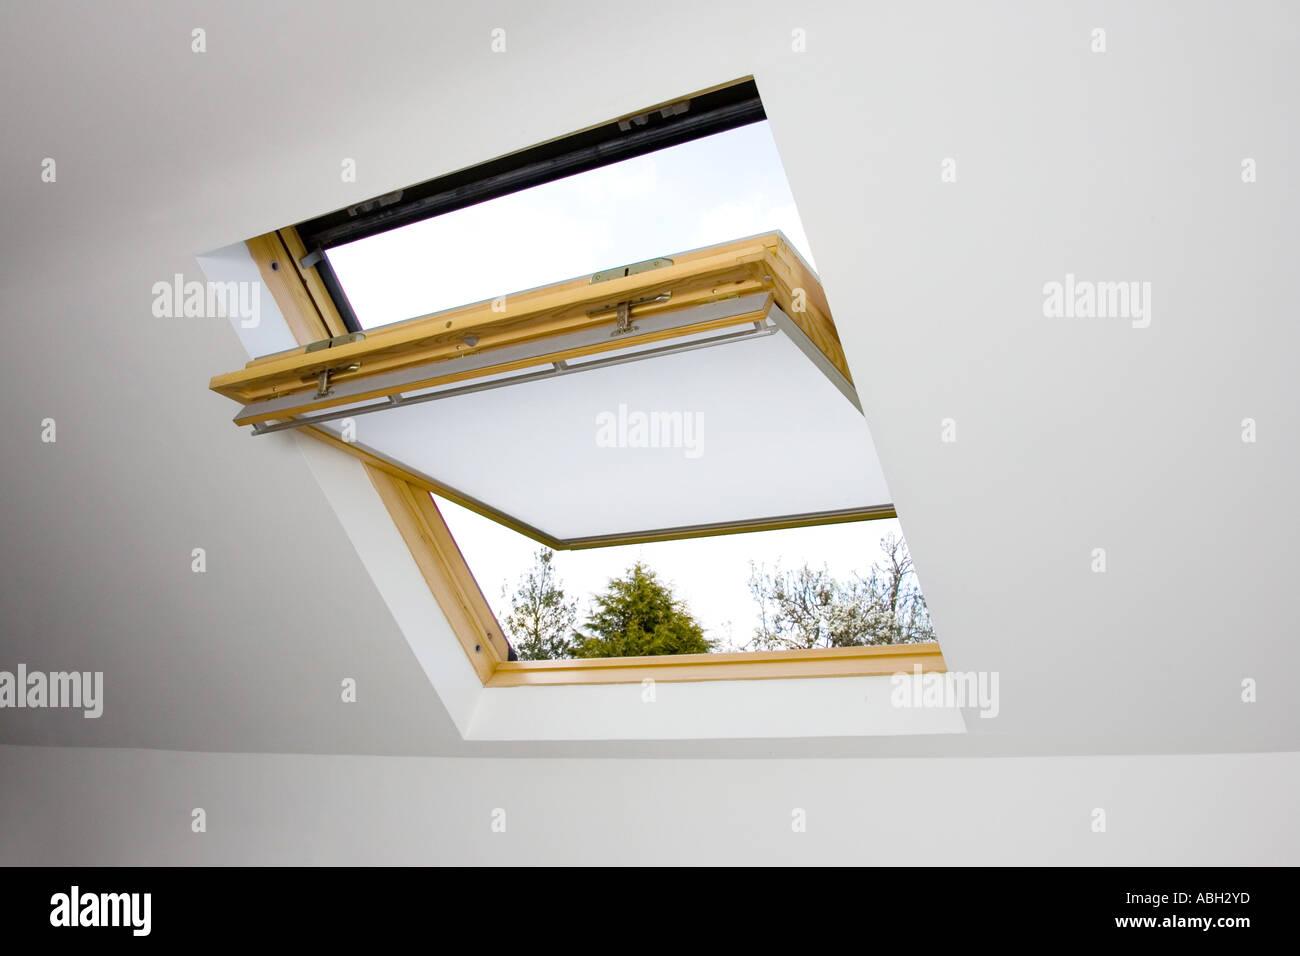 rollo fr velux dachfenster fabulous gesammelte kabel with rollo fr velux dachfenster excellent. Black Bedroom Furniture Sets. Home Design Ideas